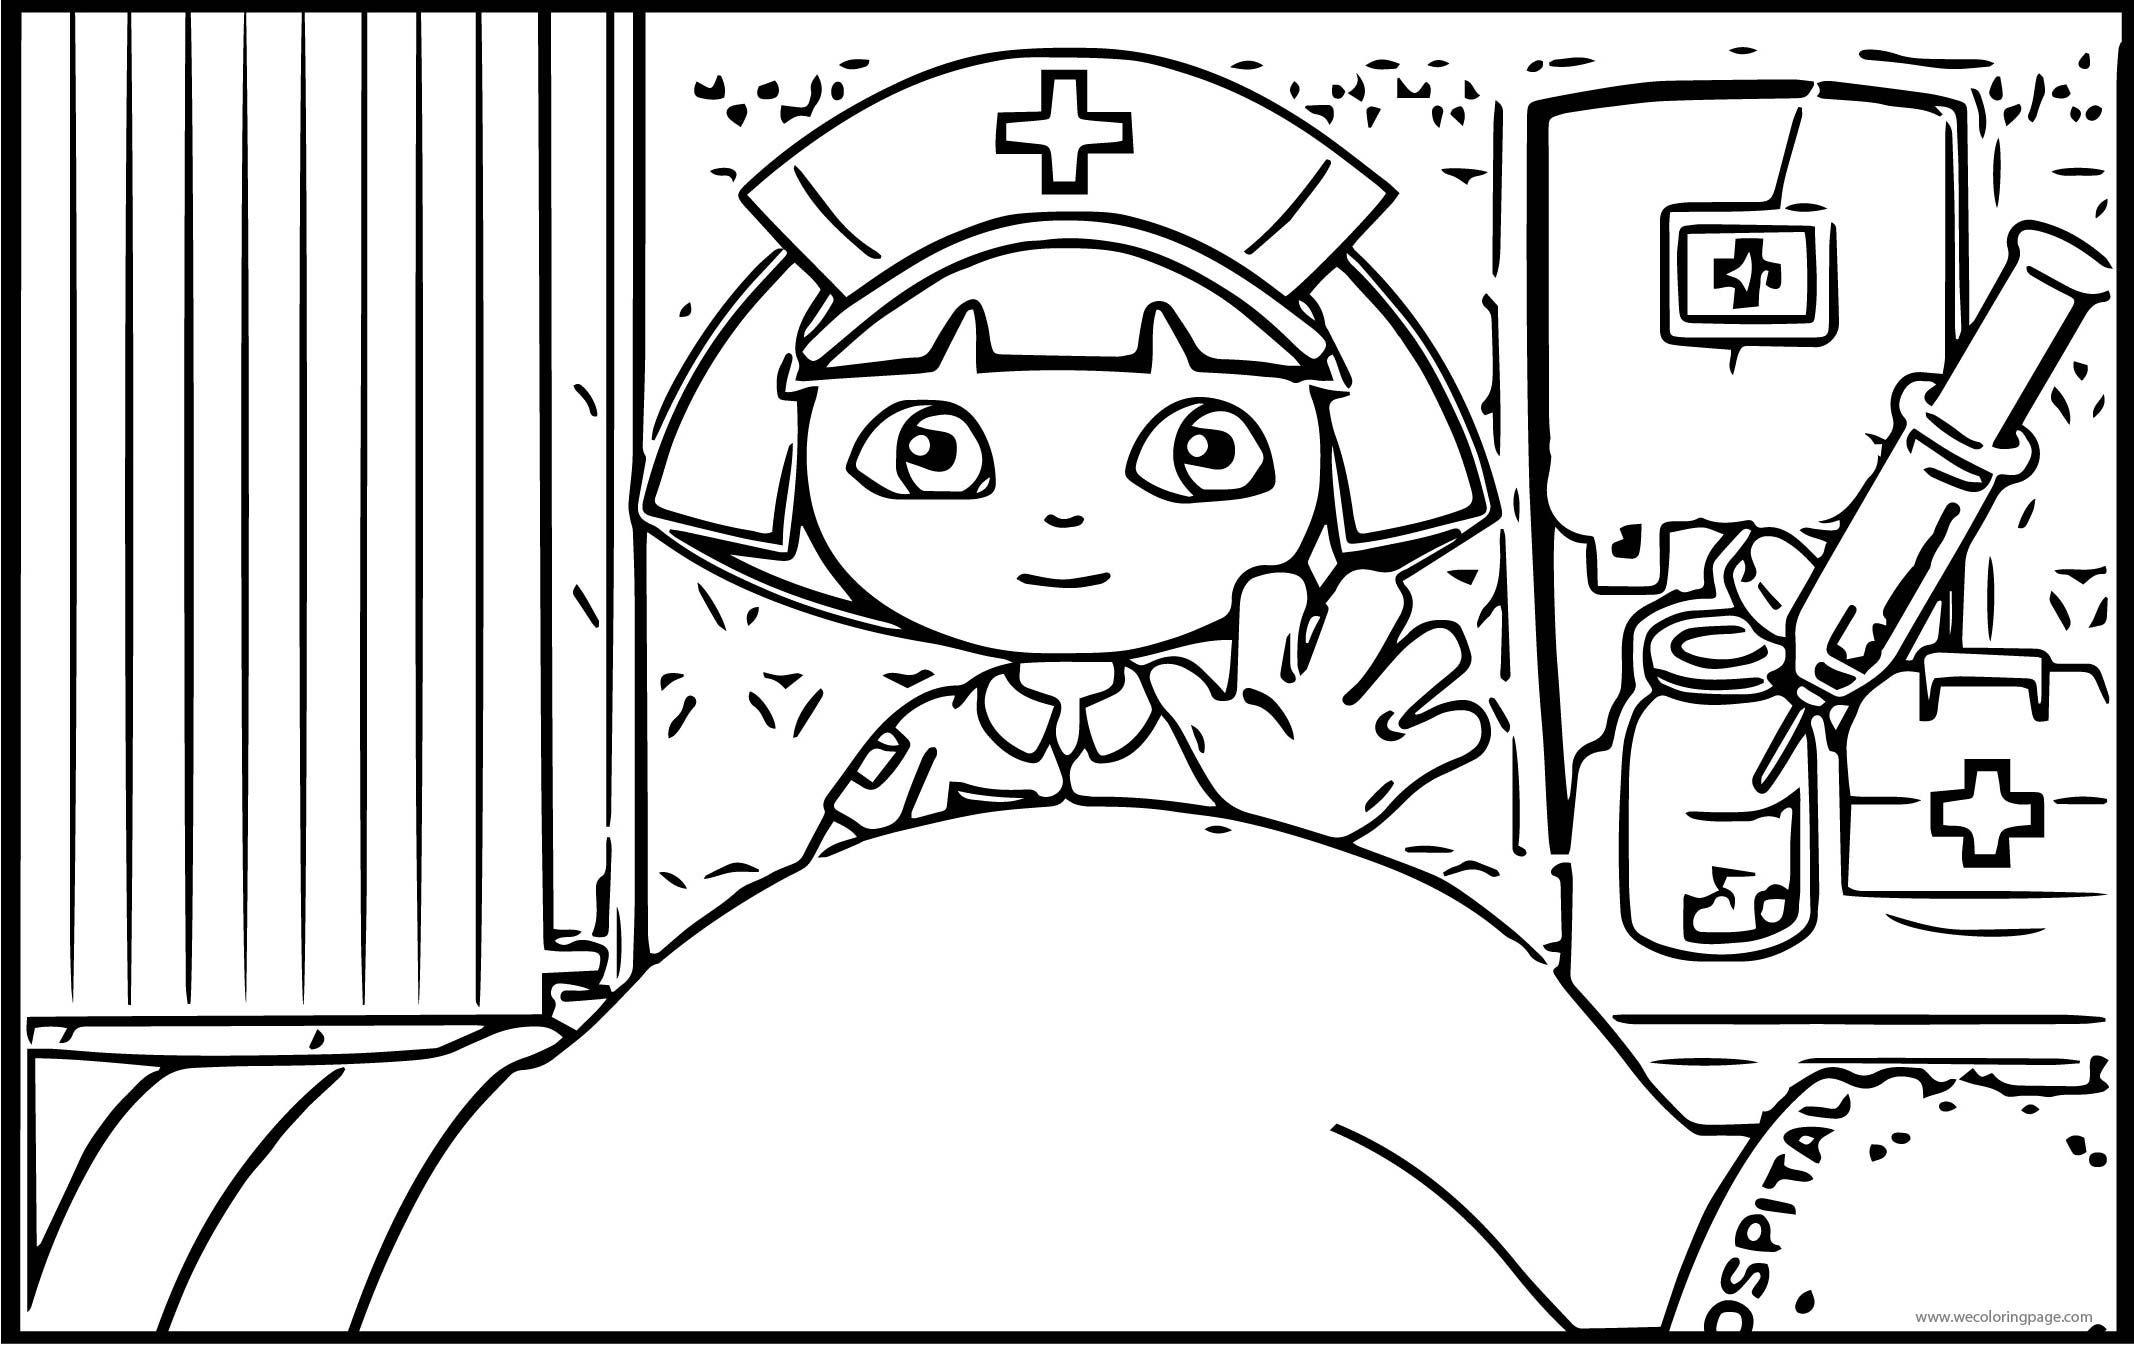 Dora The Explorer In The Hospital Coloring Page , Dora The Explorer ...